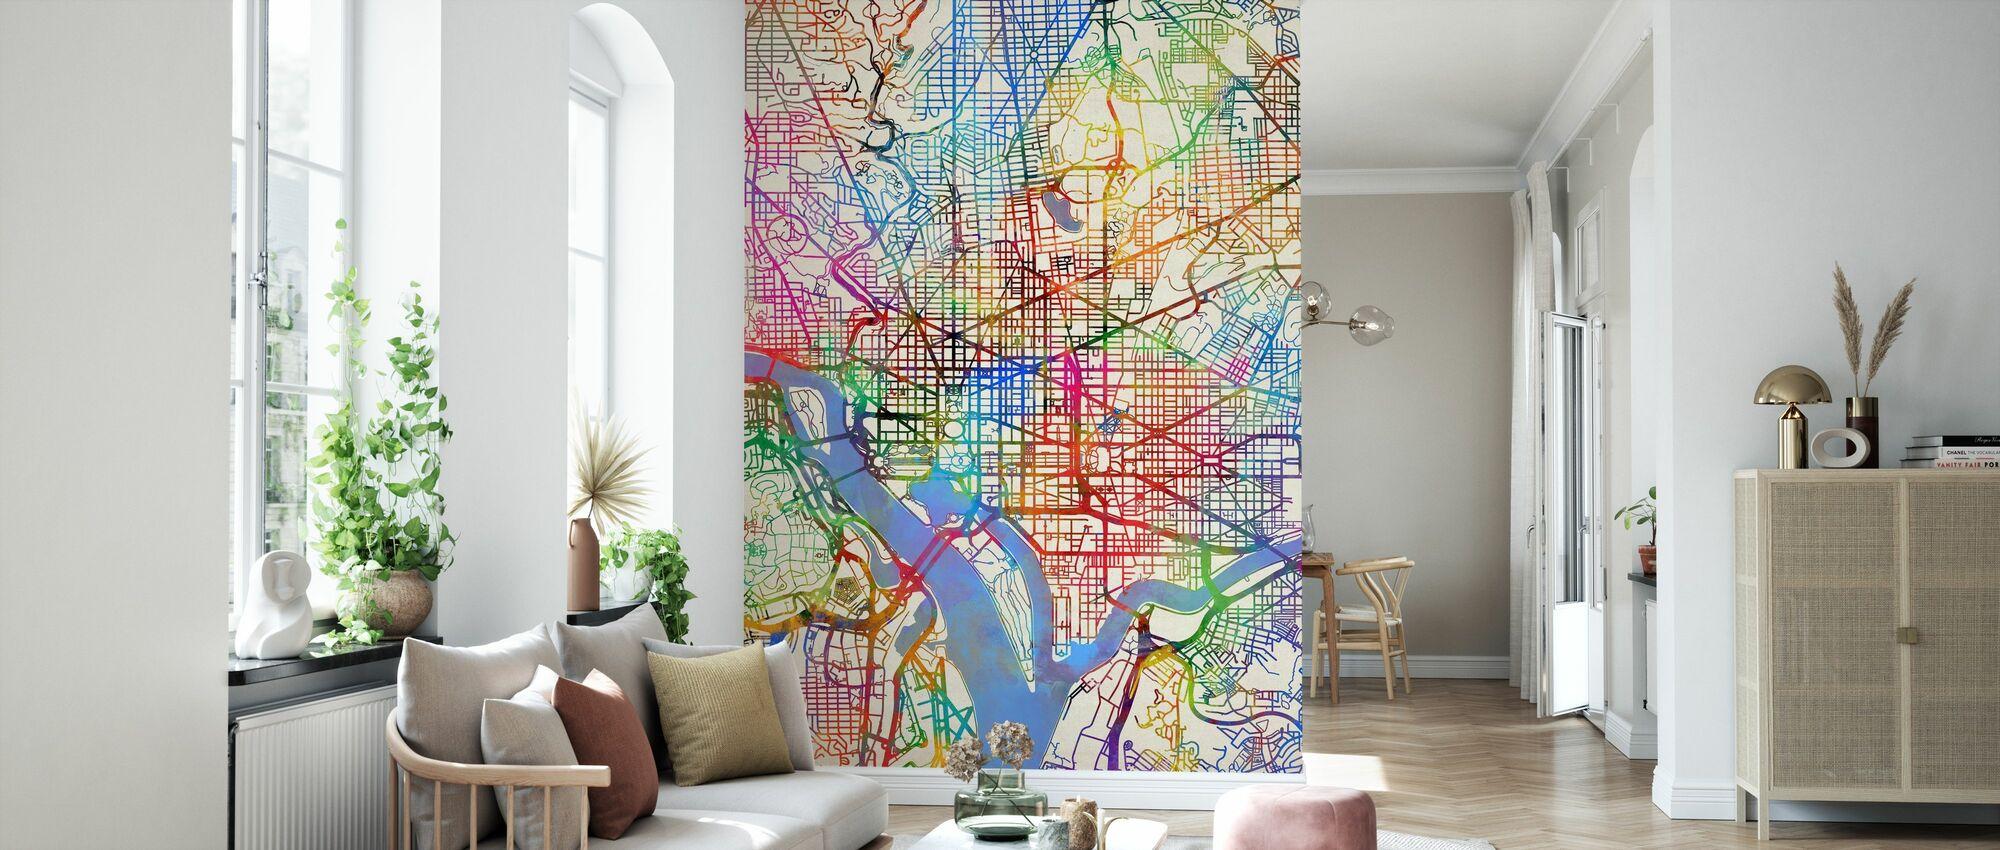 Washington DC Street Map - Wallpaper - Living Room